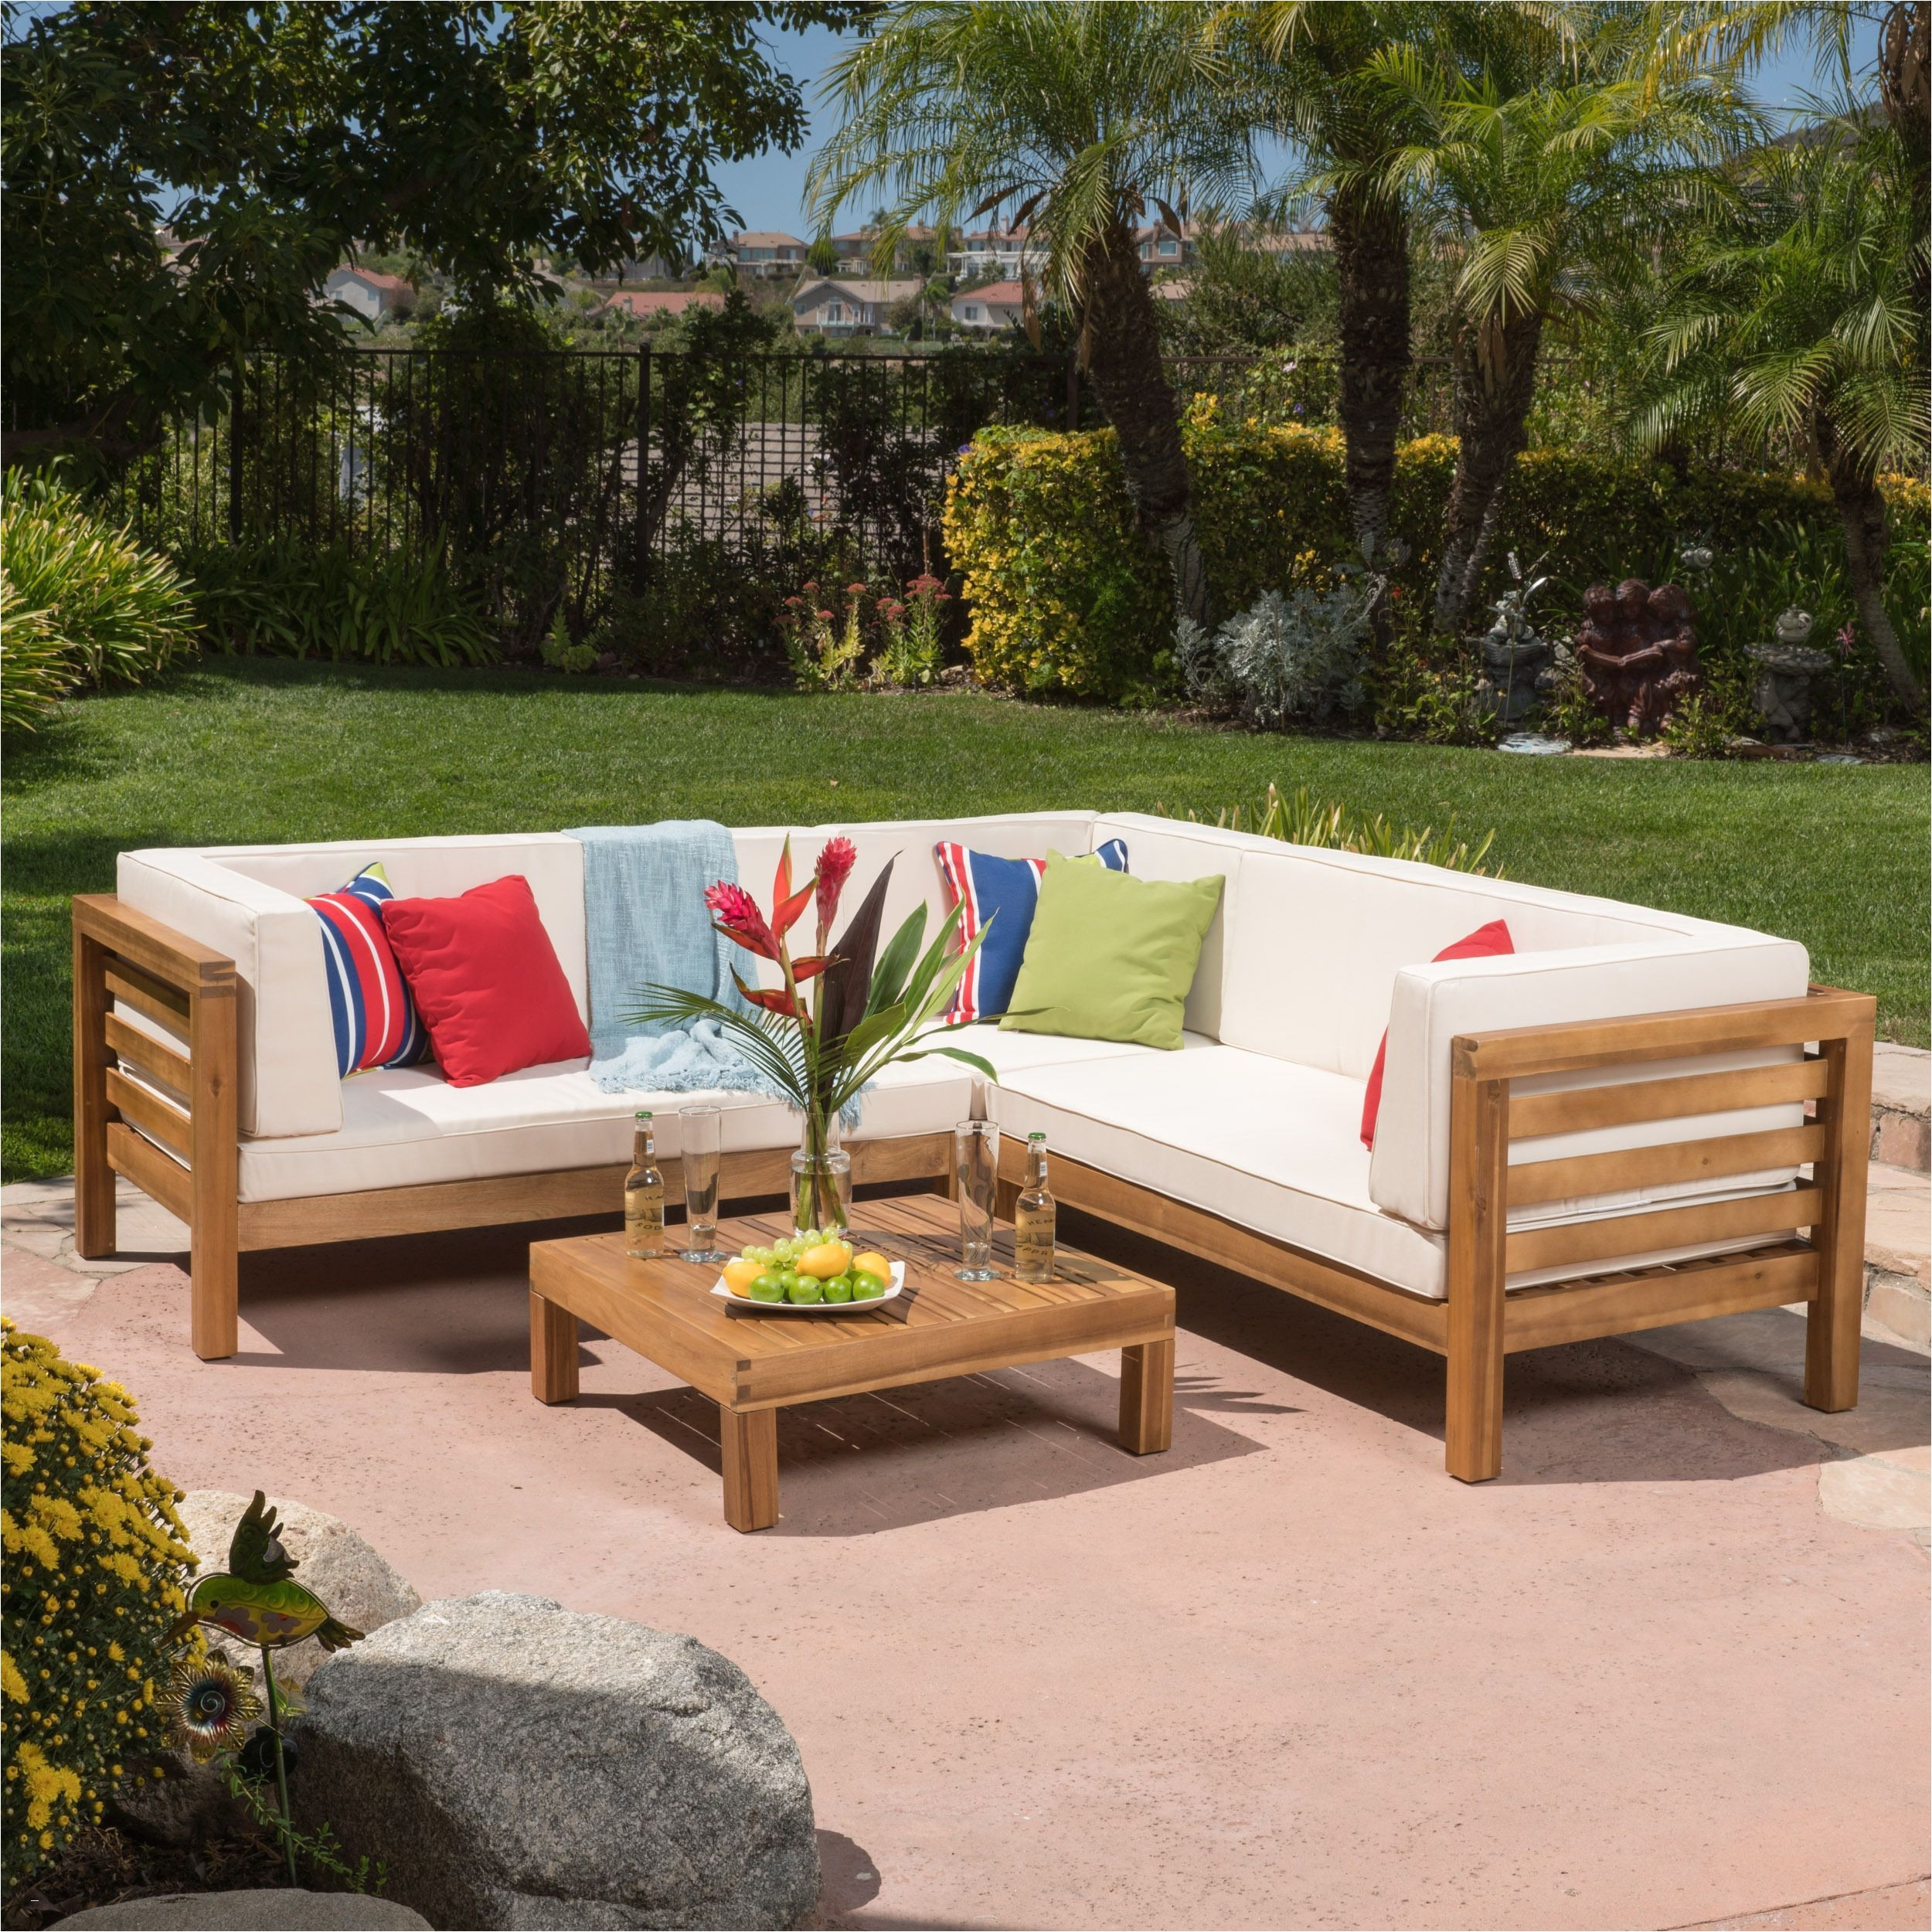 watsons outdoor furniture elegant watsons outdoor furniture beautiful unique 2x4 patio furniture